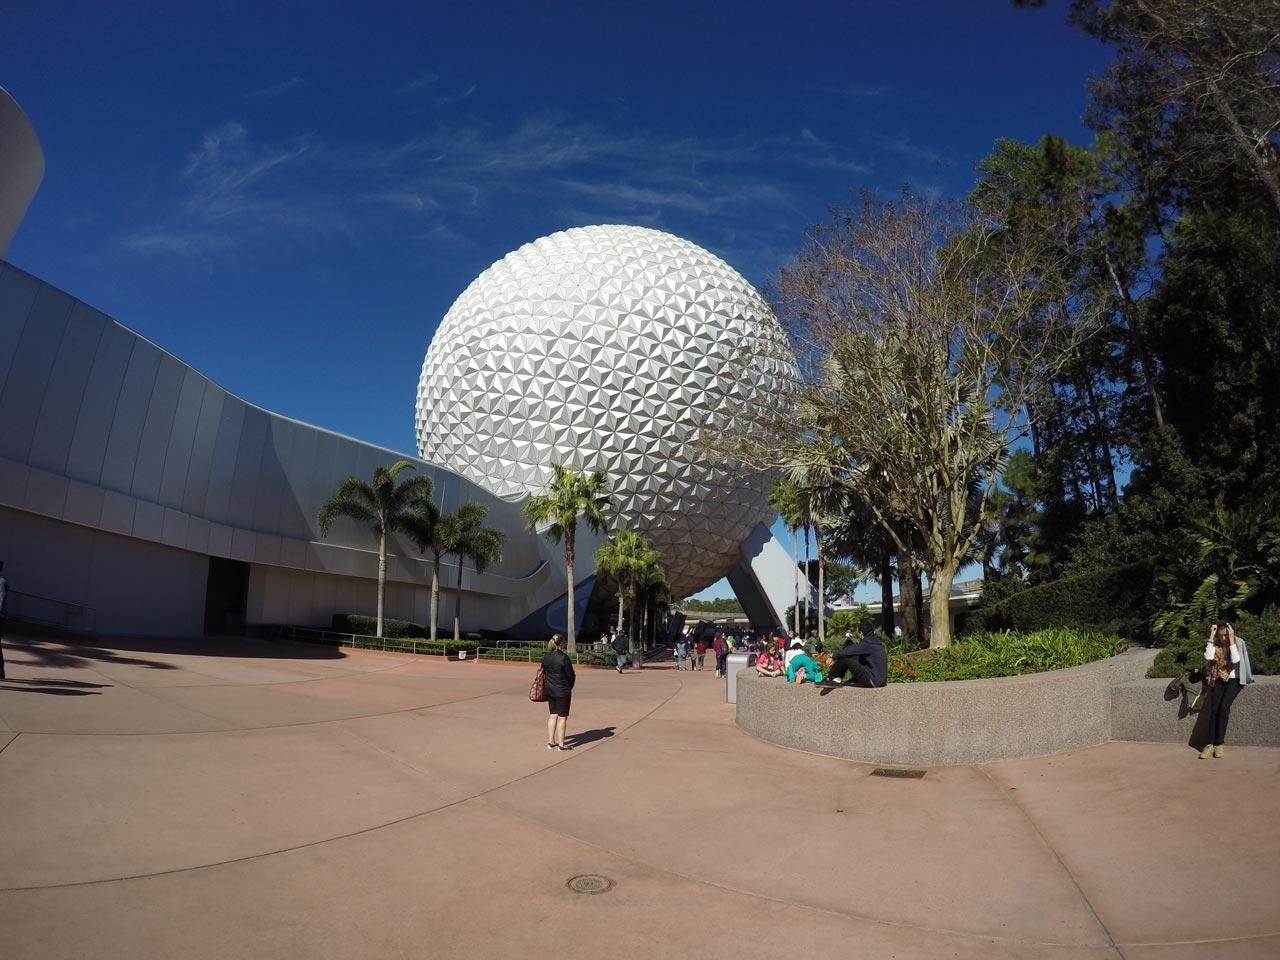 Itens proibidos nos parques da Disney, Universal e SeaWorld